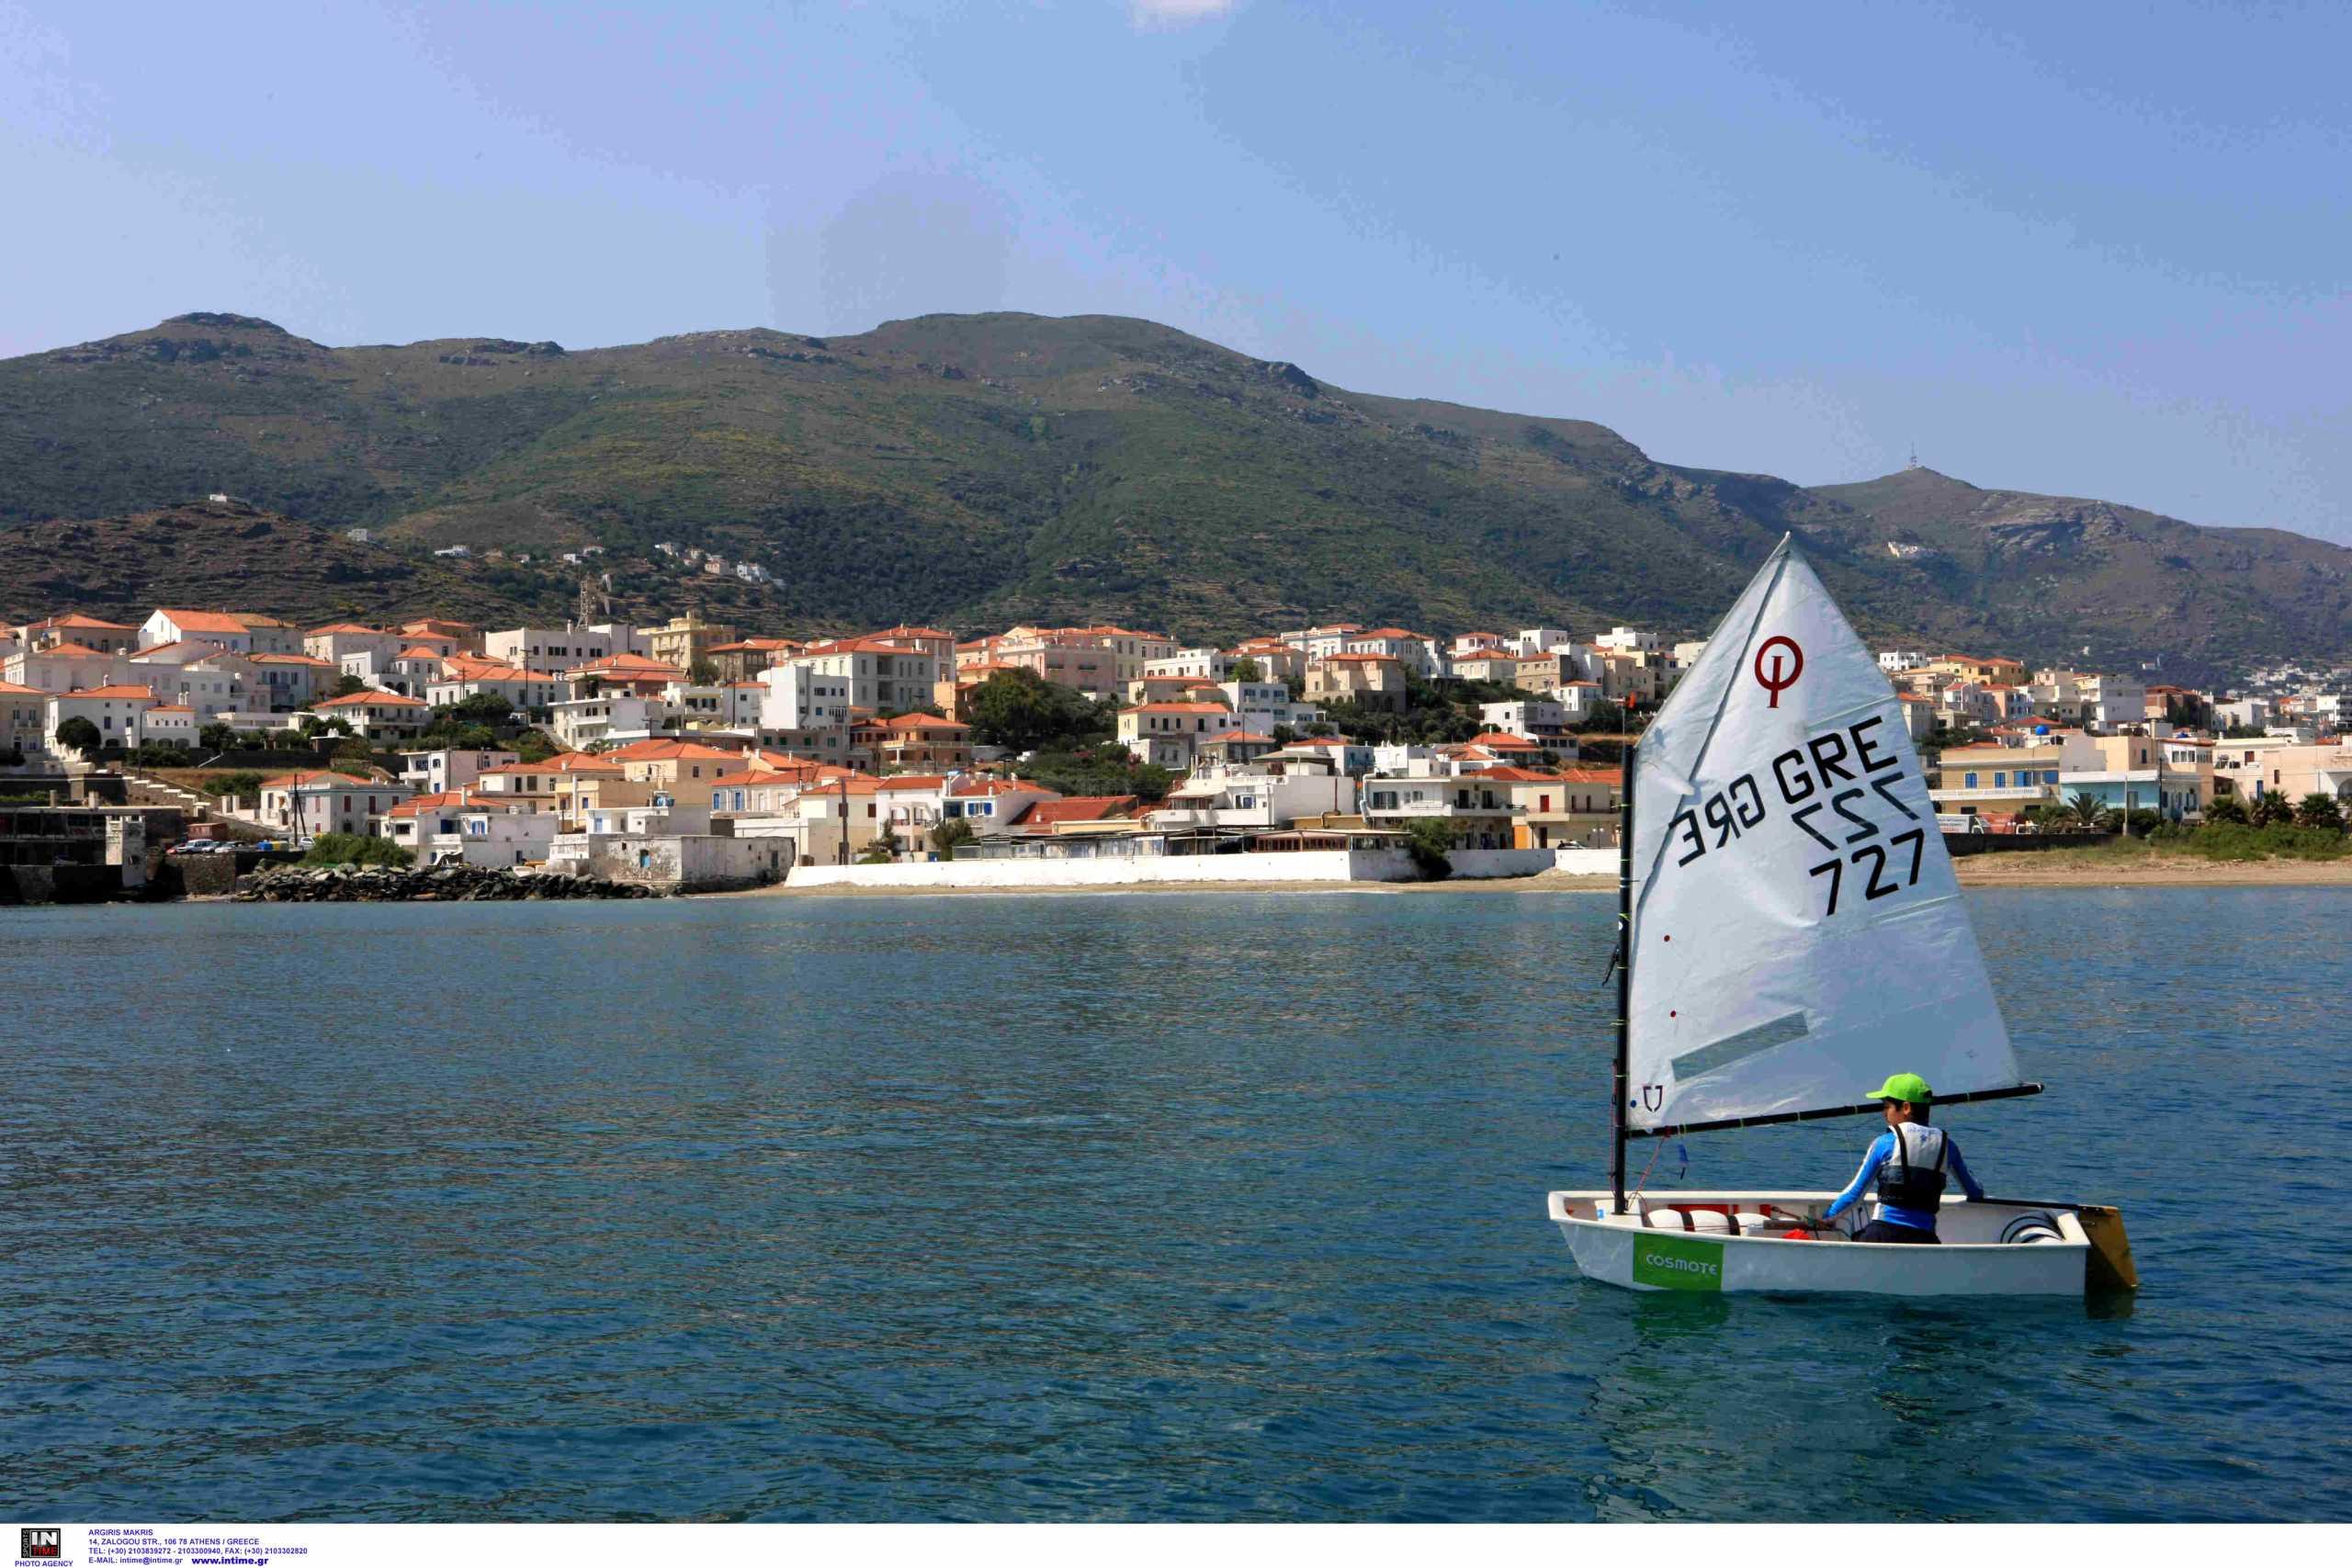 Der Spiegel: Στους δημοφιλέστερους τουριστικούς προορισμούς η Ελλάδα – Πρωτιά για την Άνδρο